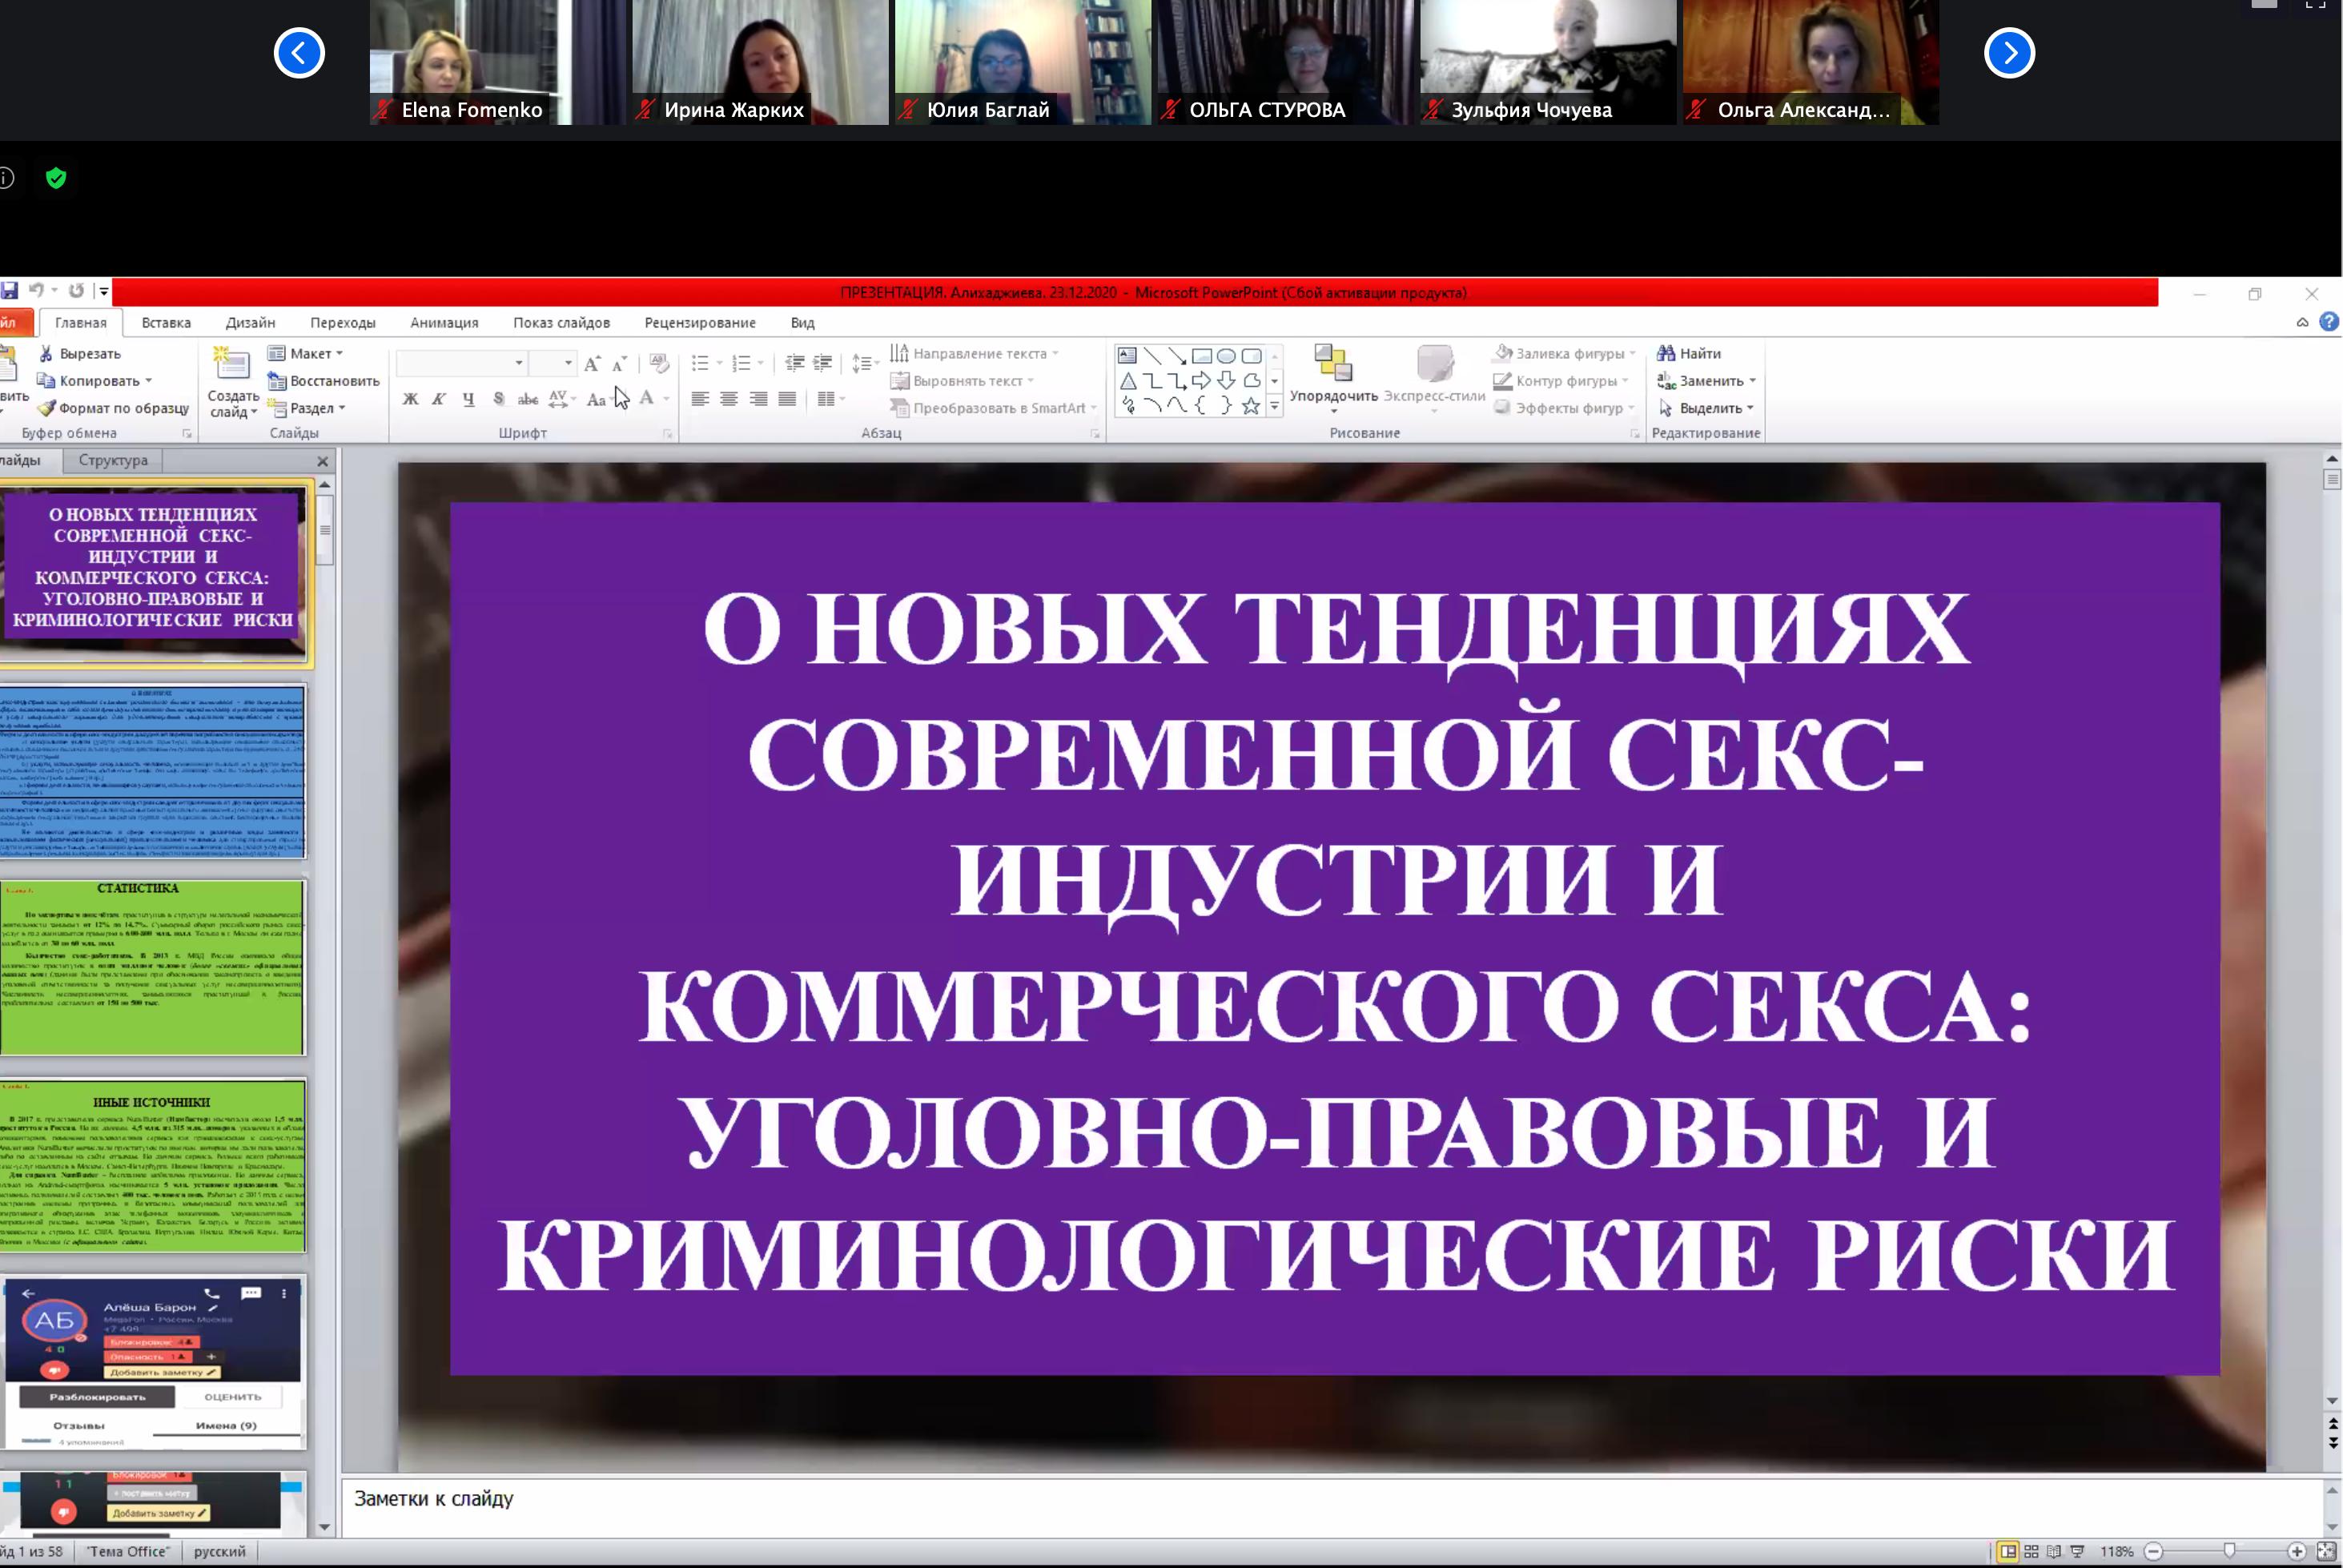 Снимок экрана 2020-12-23 в 17.30.55